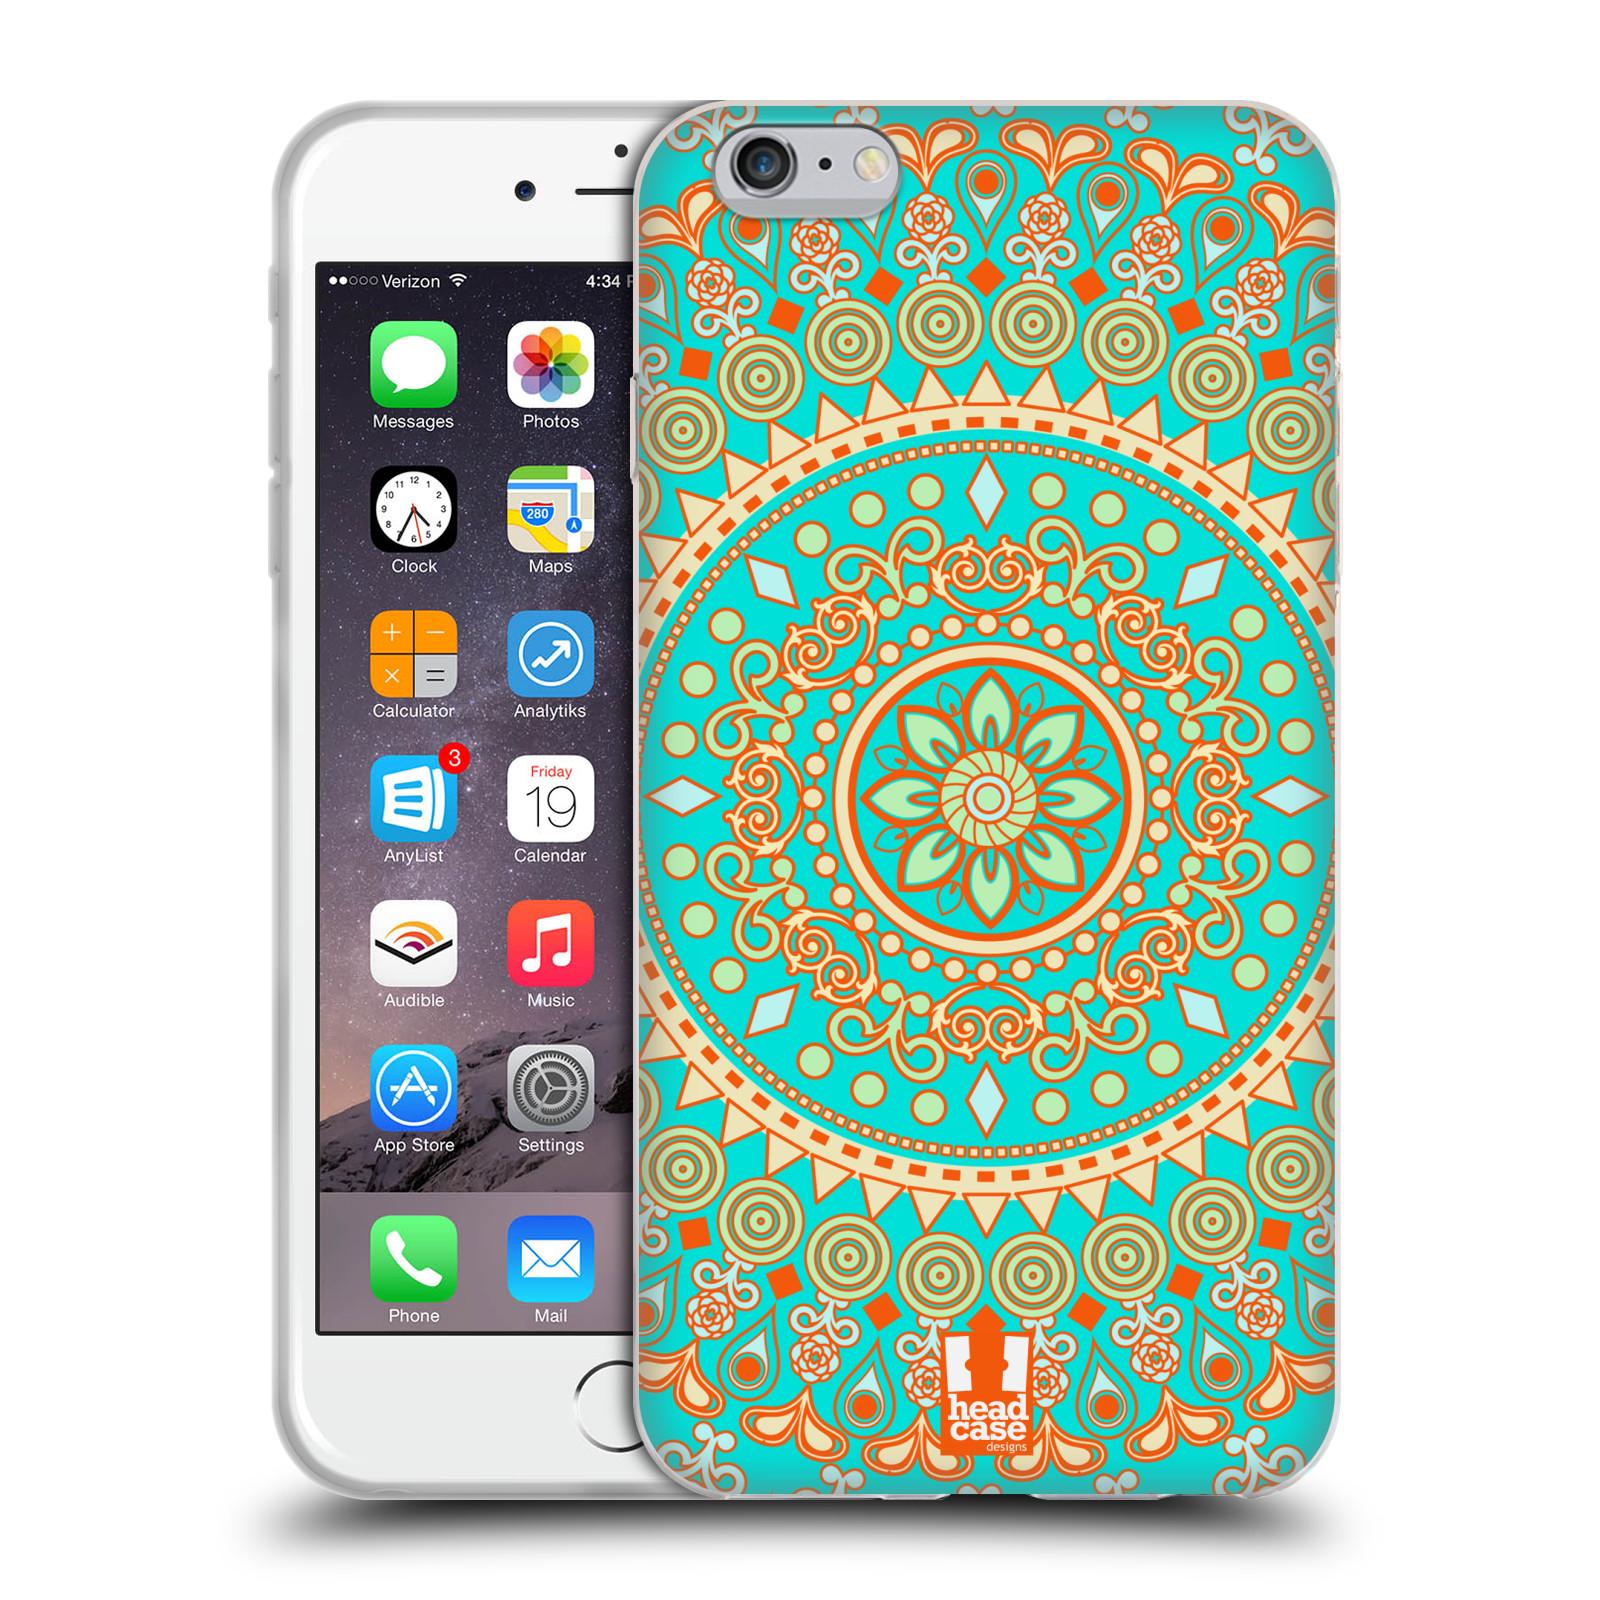 HEAD CASE silikonový obal na mobil Apple Iphone 6 PLUS/ 6S PLUS vzor Indie Mandala slunce barevný motiv TYRKYSOVÁ, ZELENÁ